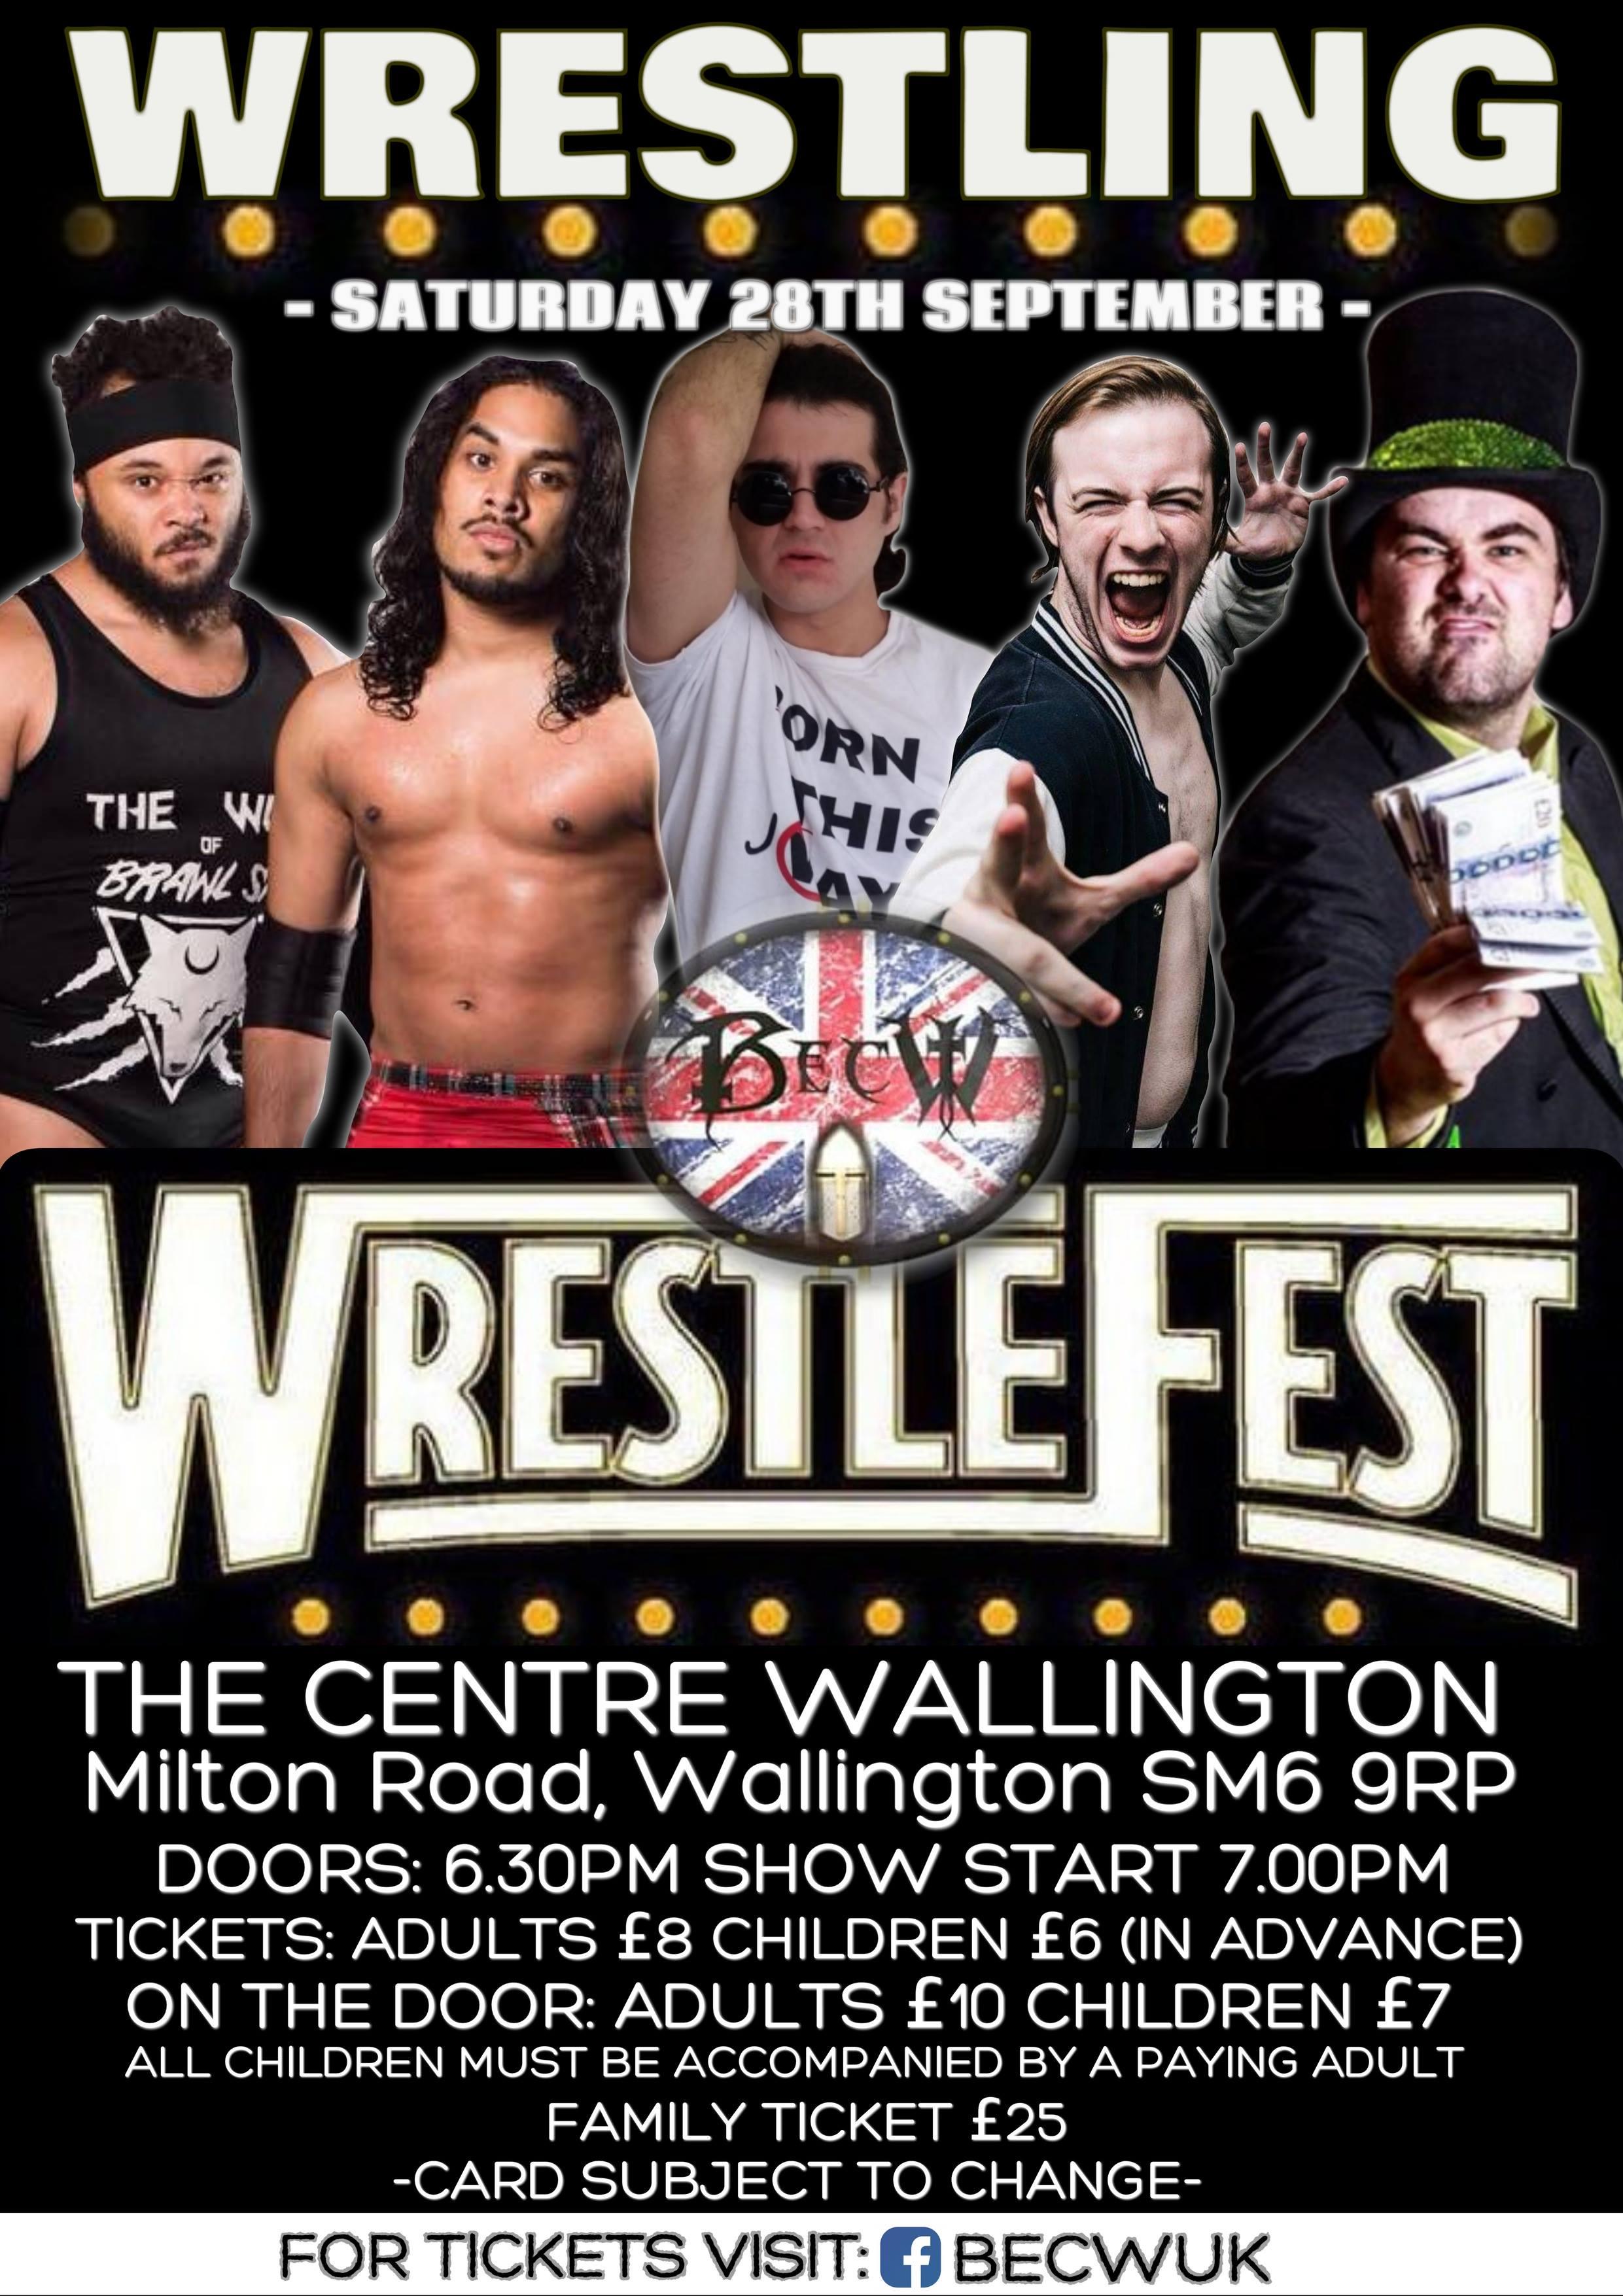 BECW Wrestlefest 6  event description image